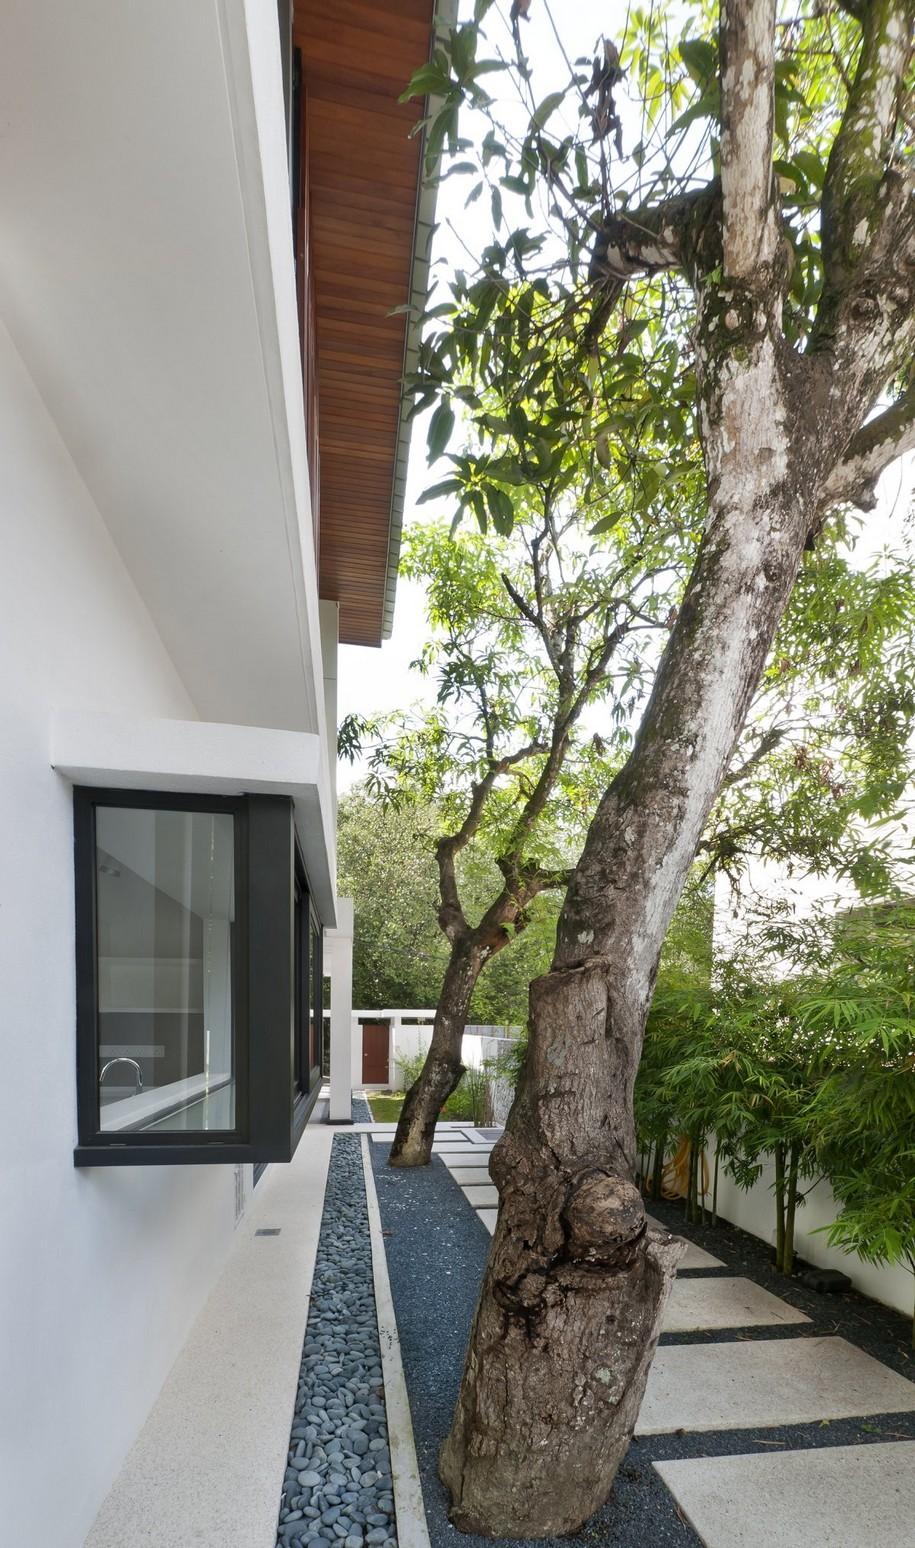 Hijauan House среди пальм Куала-Лумпура, Малайзия